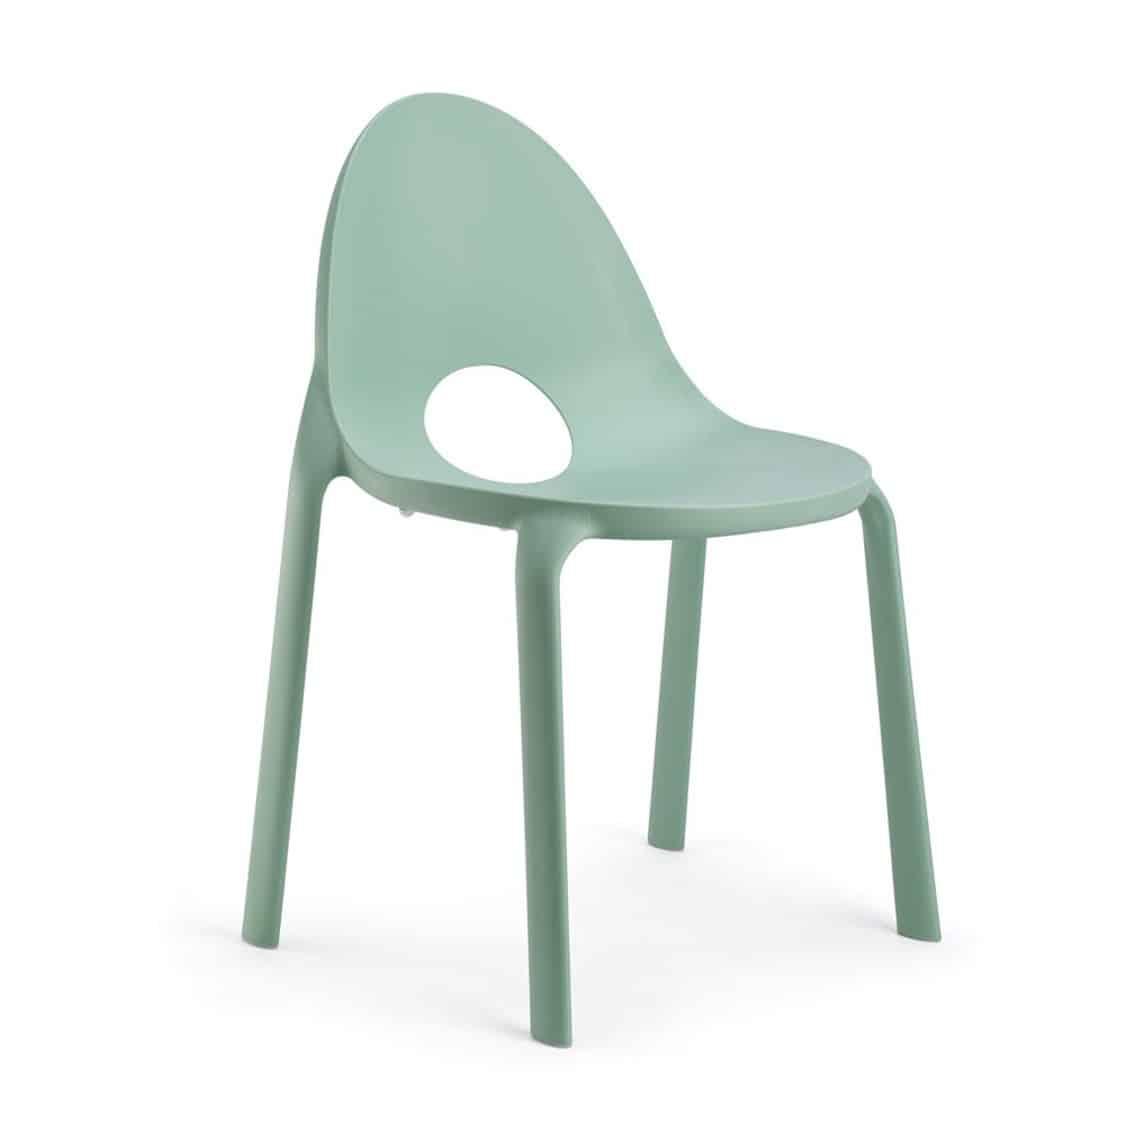 Drop Side Chair Infiniti Design at DeFrae Green Stackable